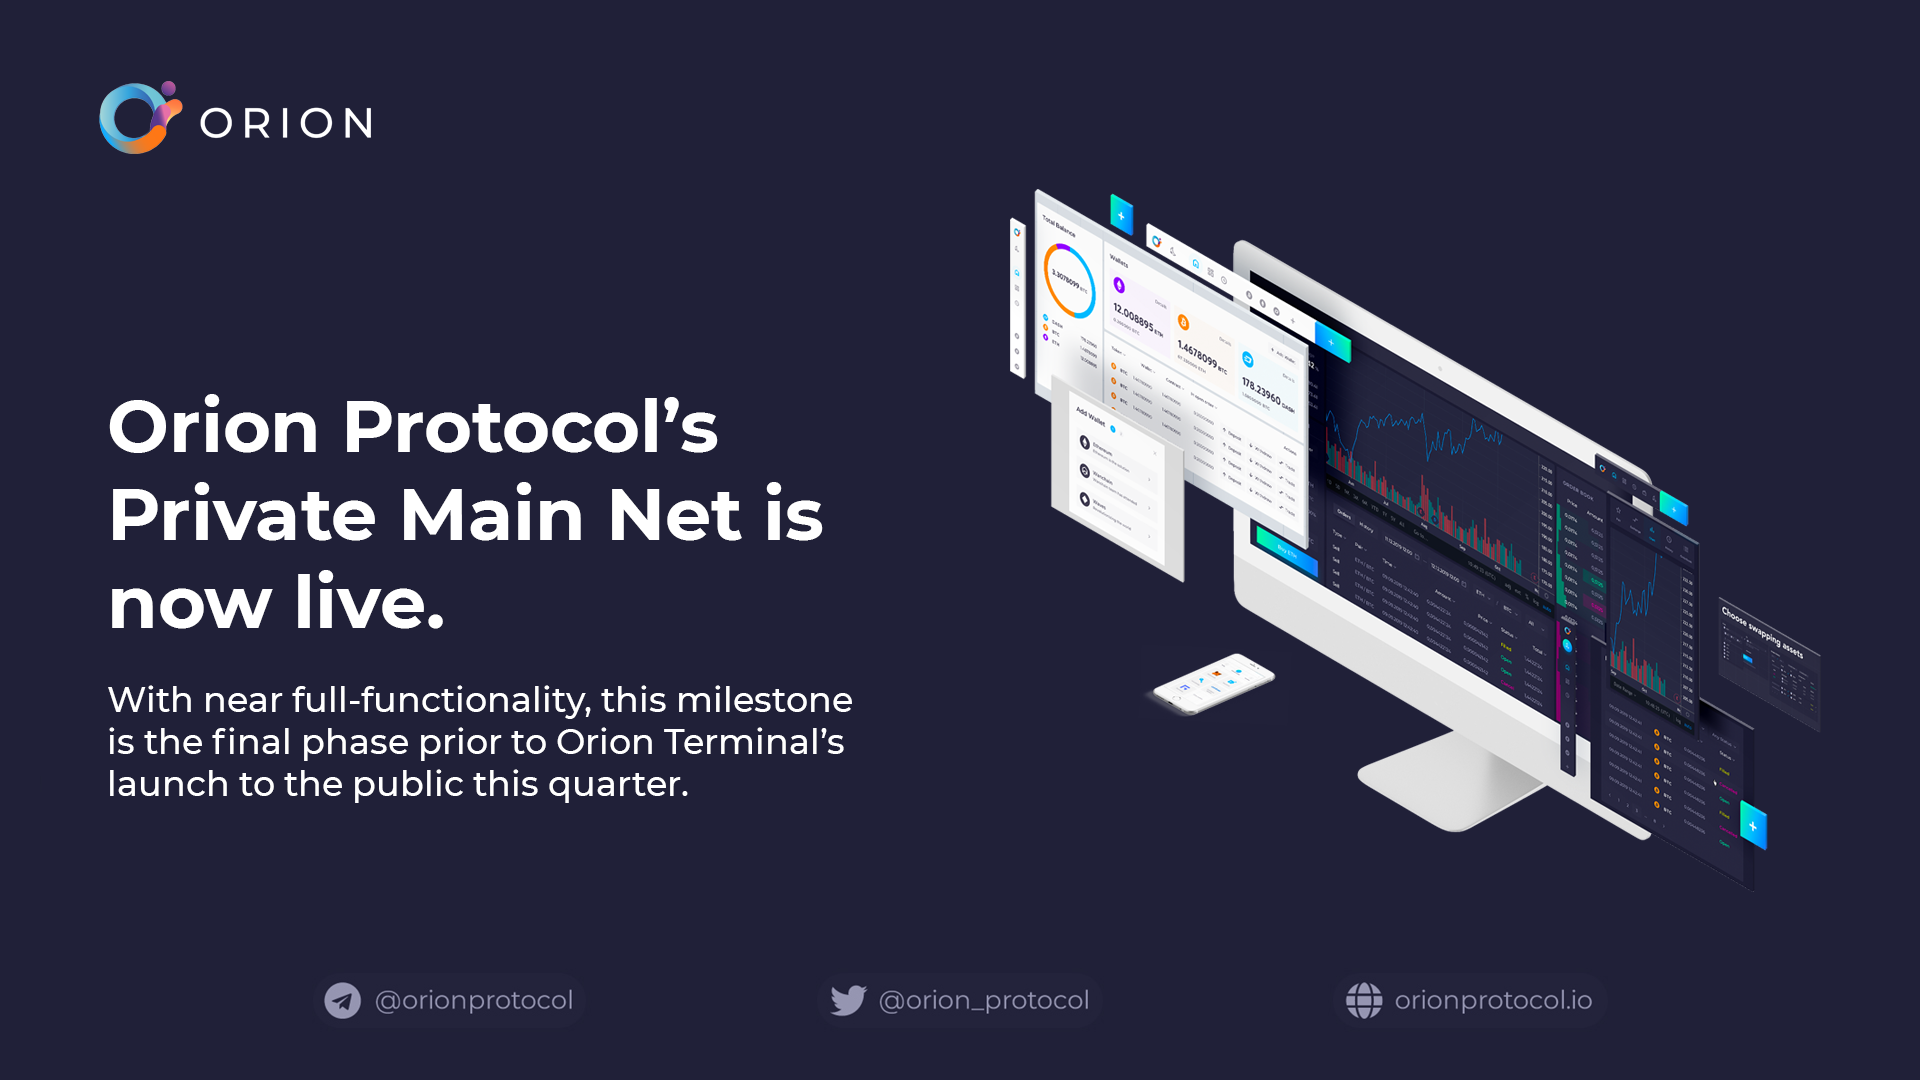 Private Main Net